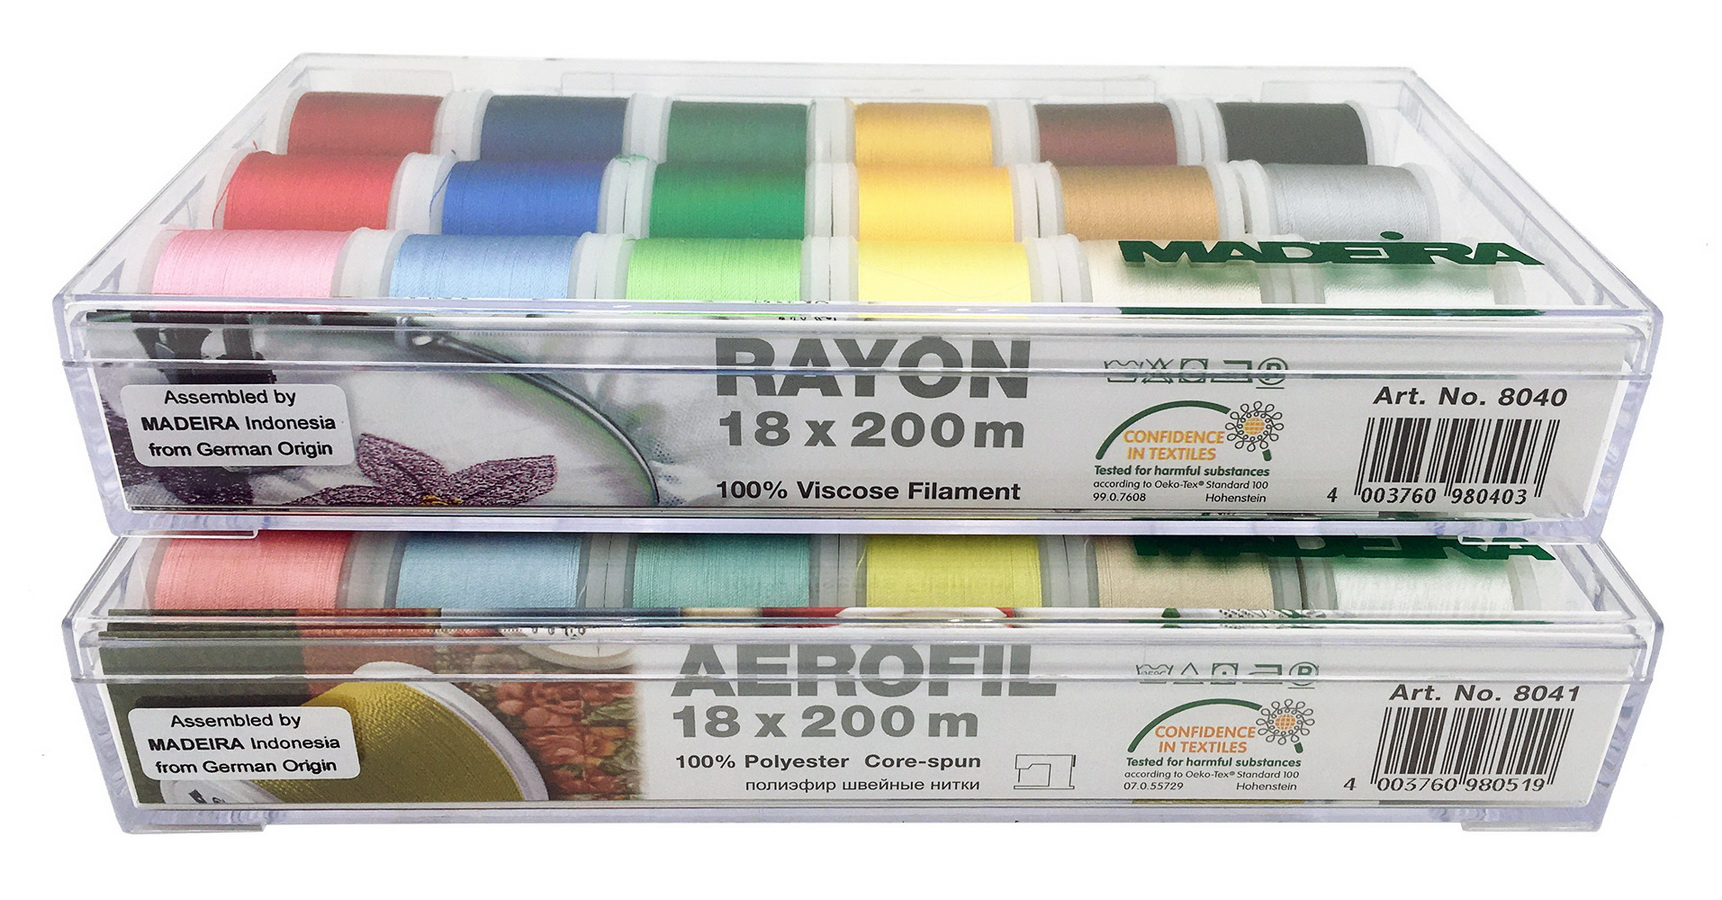 Doorbuster Madeira 36 Spool Thread Set (2 18 Spool Thread Kits) Rayon & Aerofil